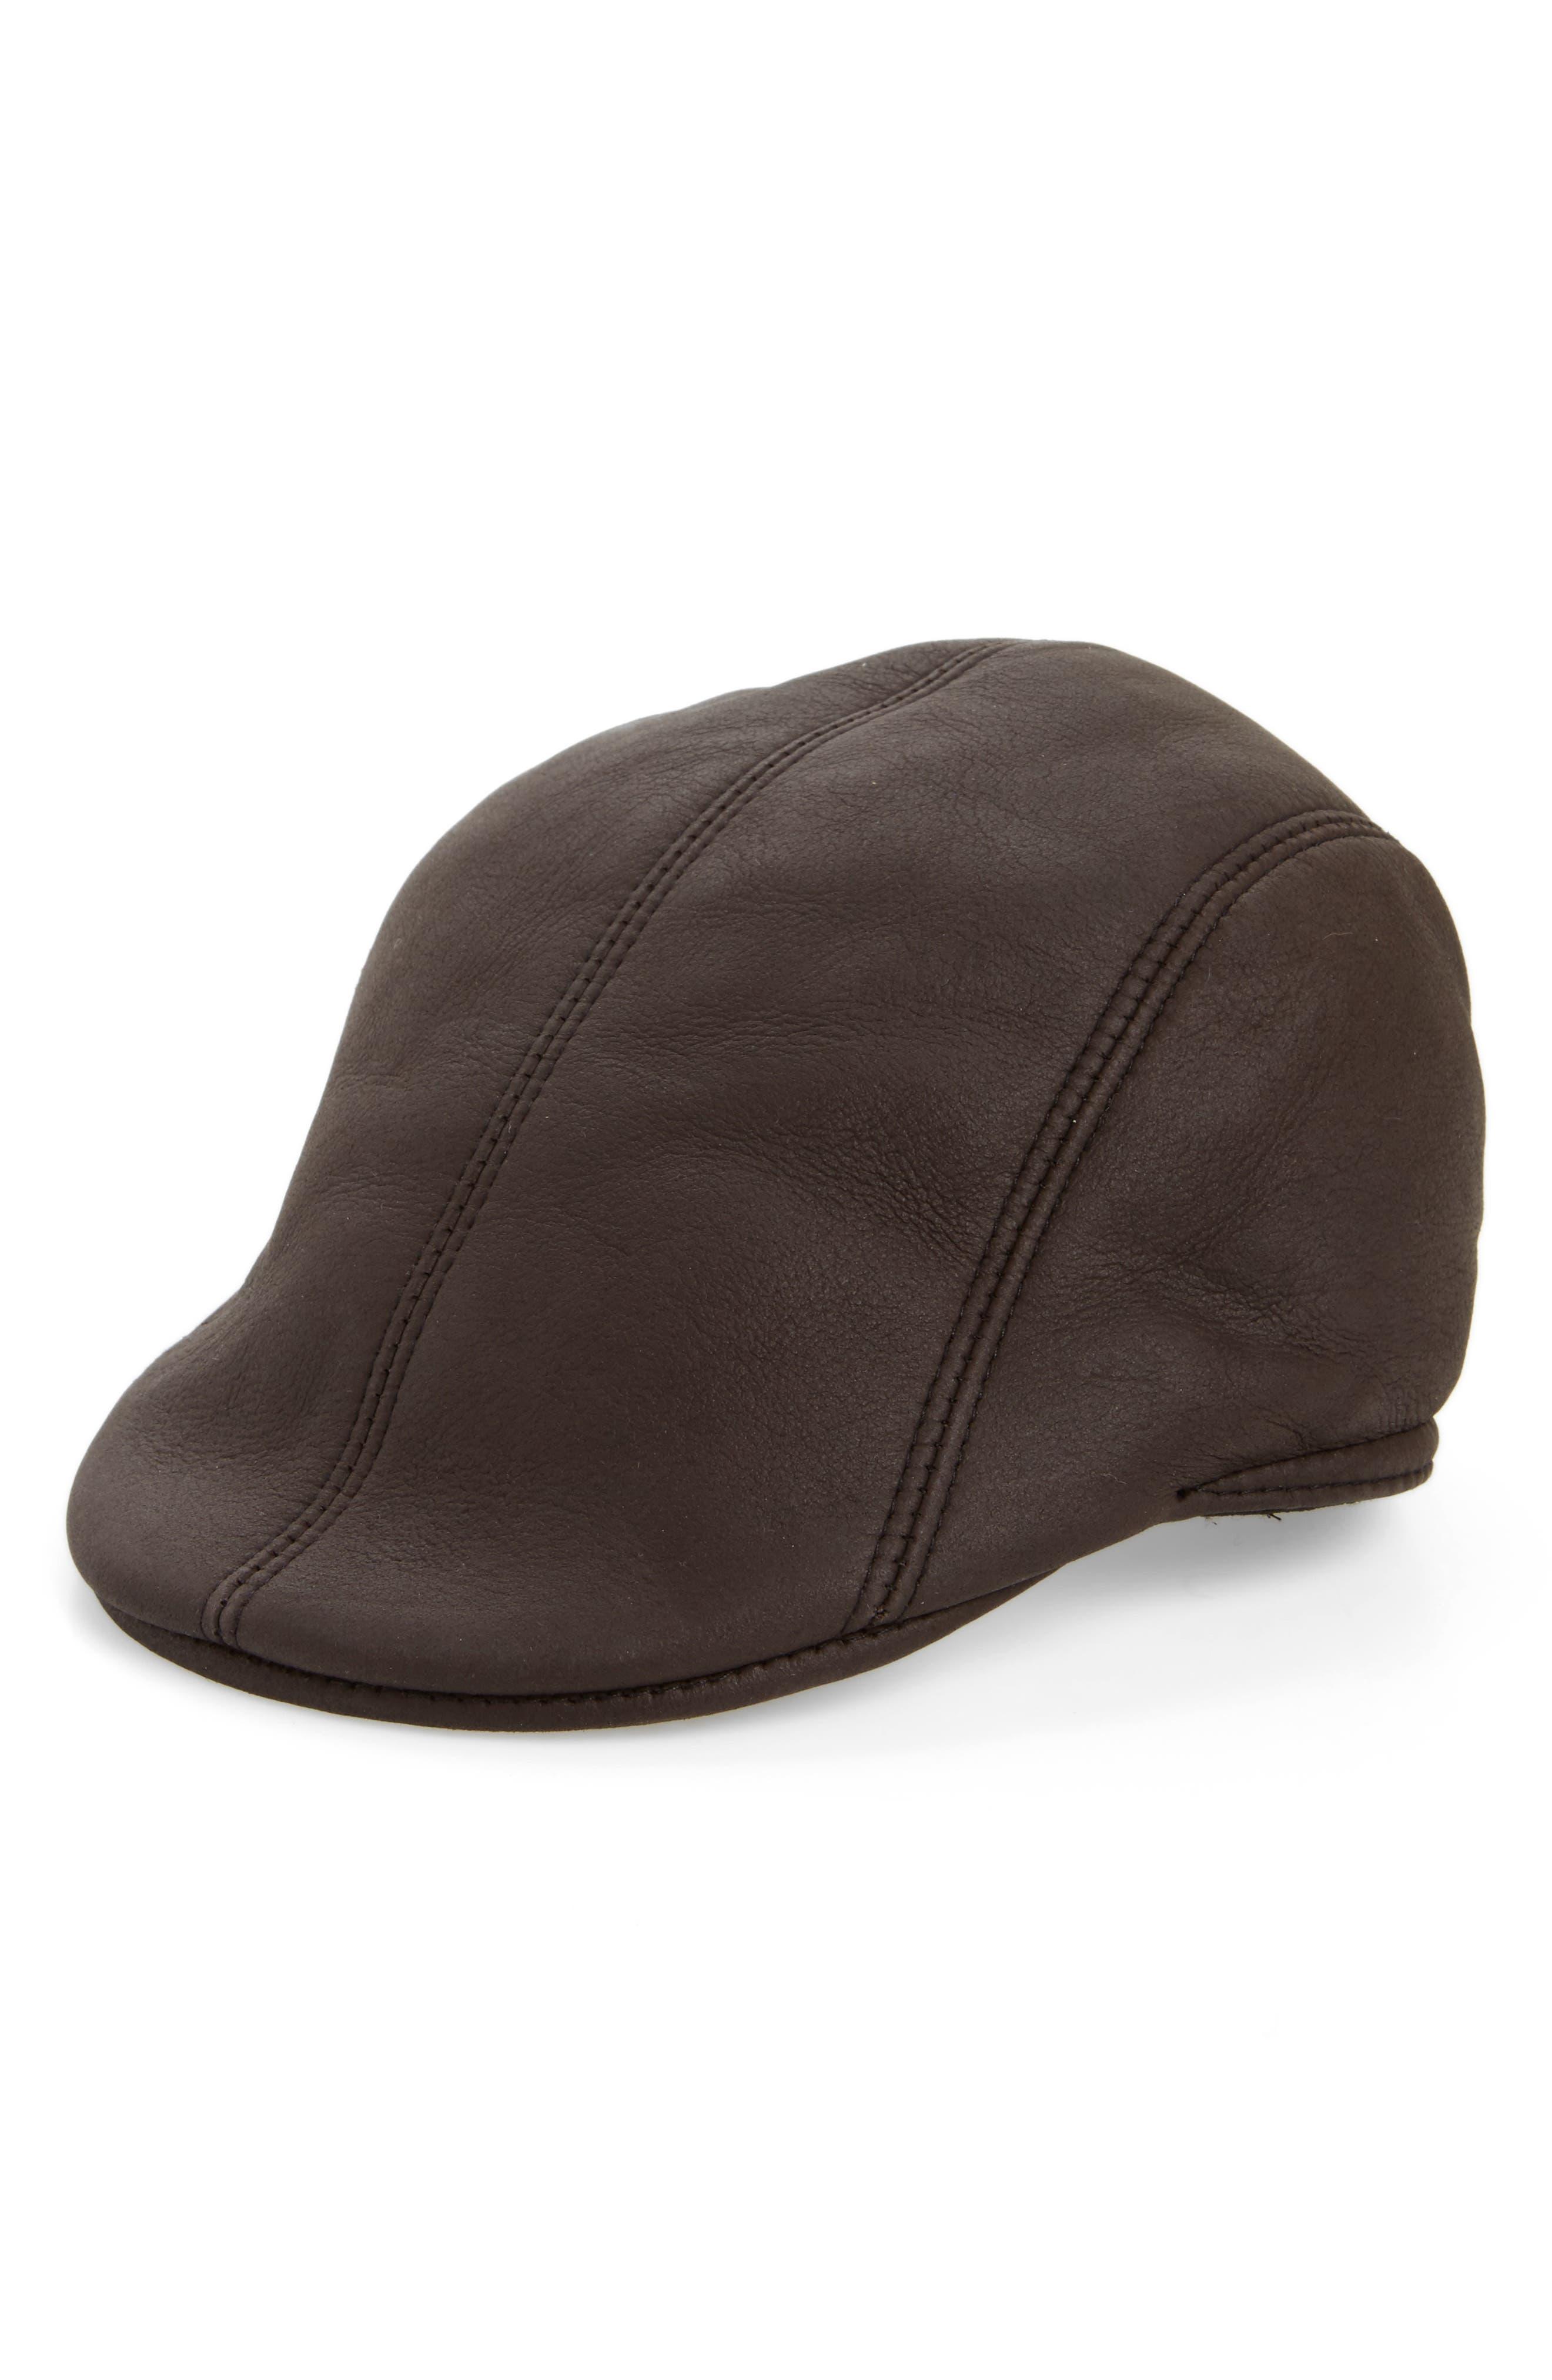 Alternate Image 1 Selected - Crown Cap Genuine Shearling Leather Driving Cap